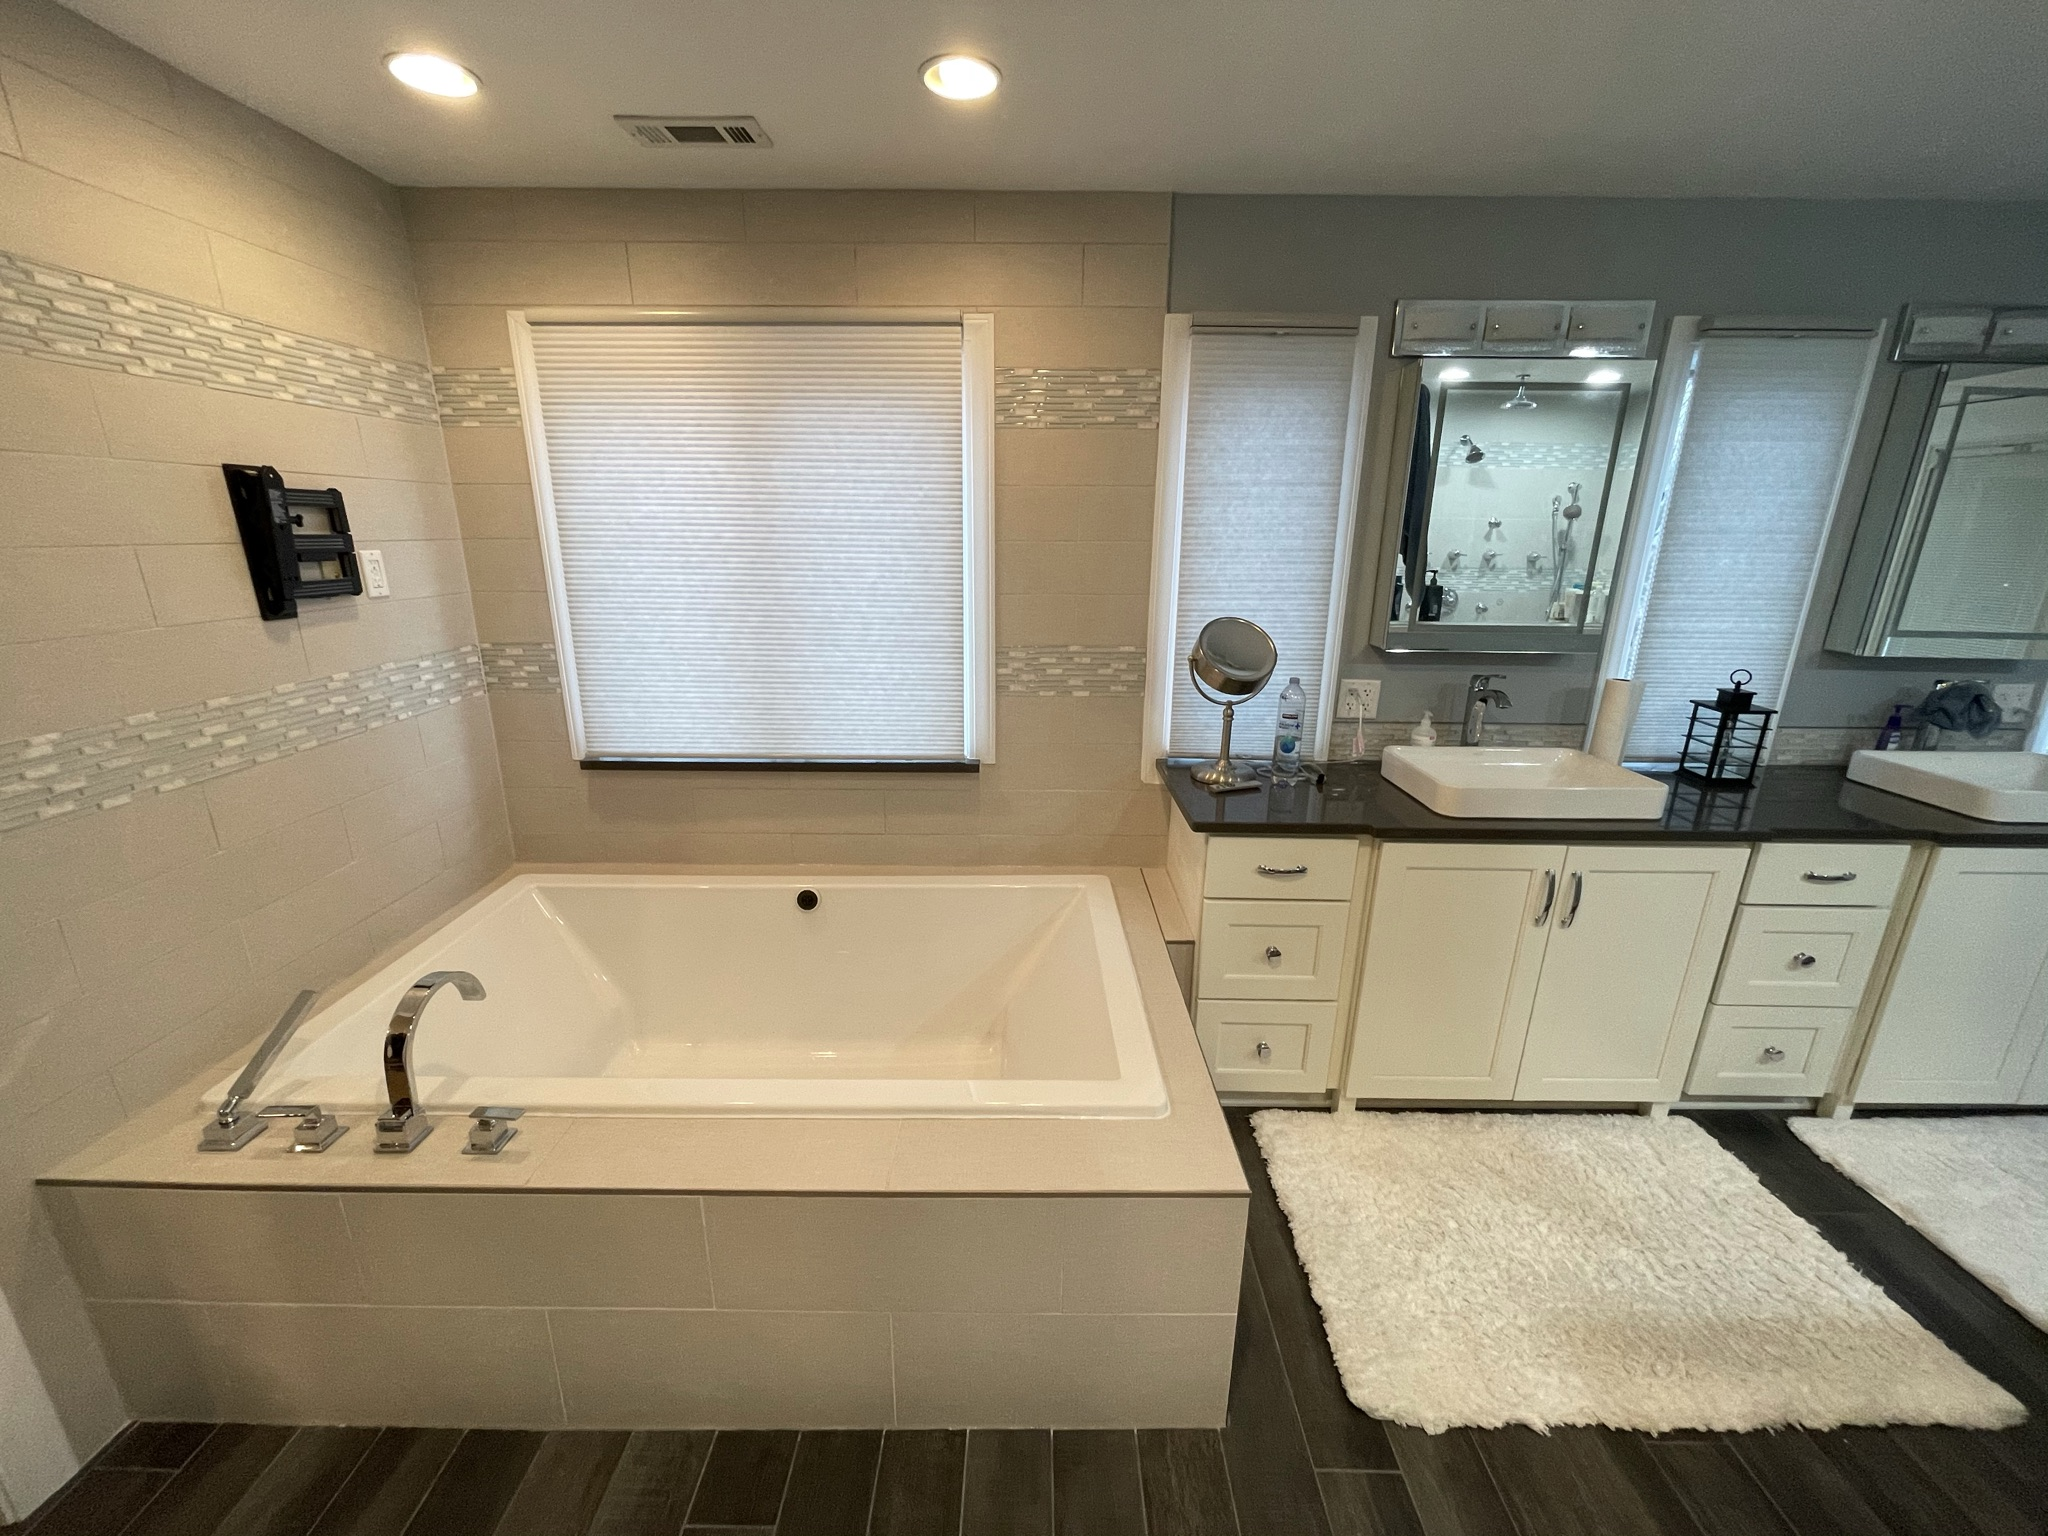 Bathroom with custom square jacuzzi tub